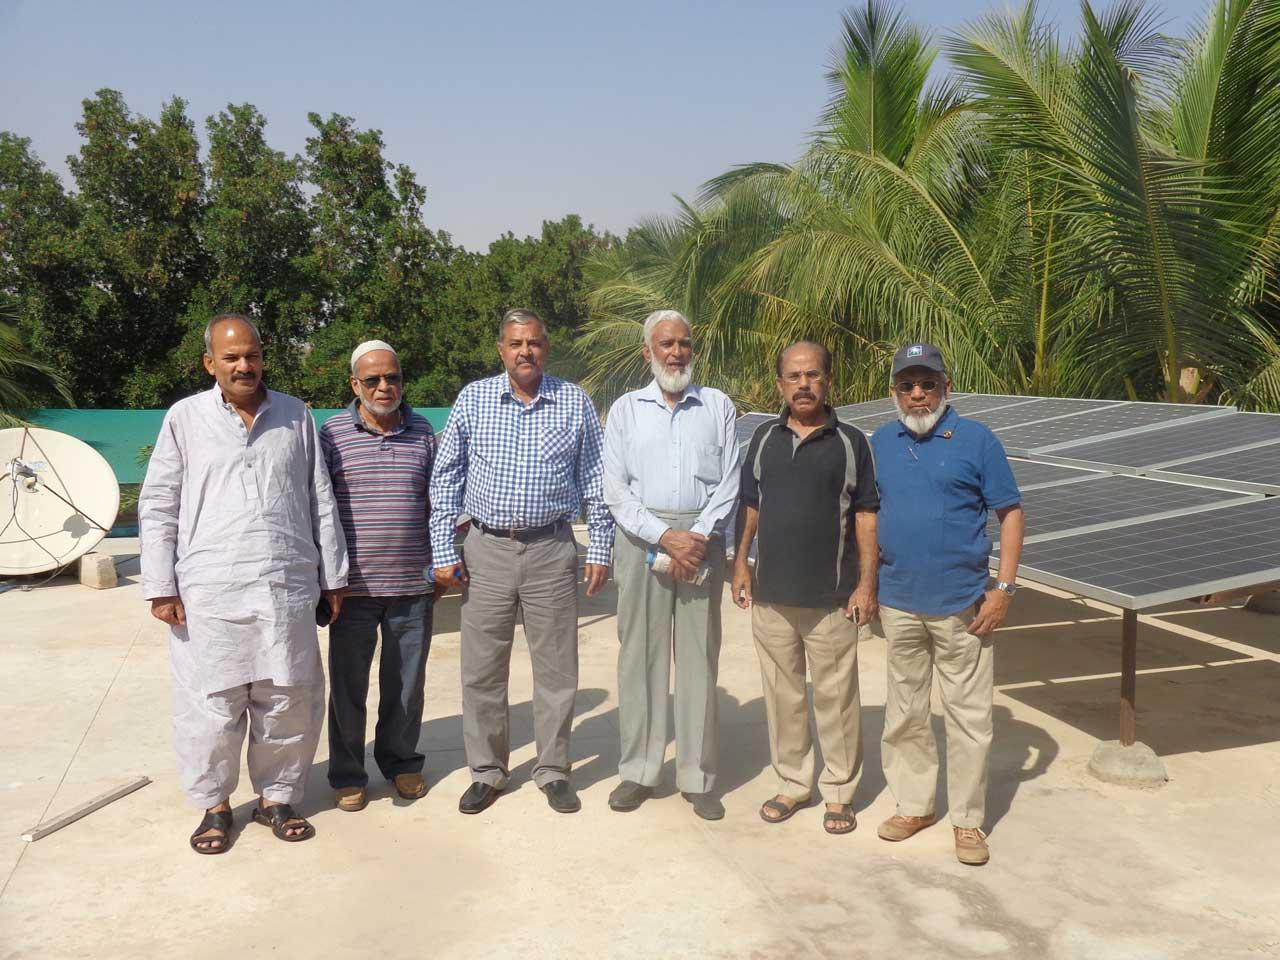 Afzal A. Farooqi, MA Mateen, Arif Qamar, Kamal A. Farooqi, Shafiq A. Khan, Engr. Iqbal A. Khan